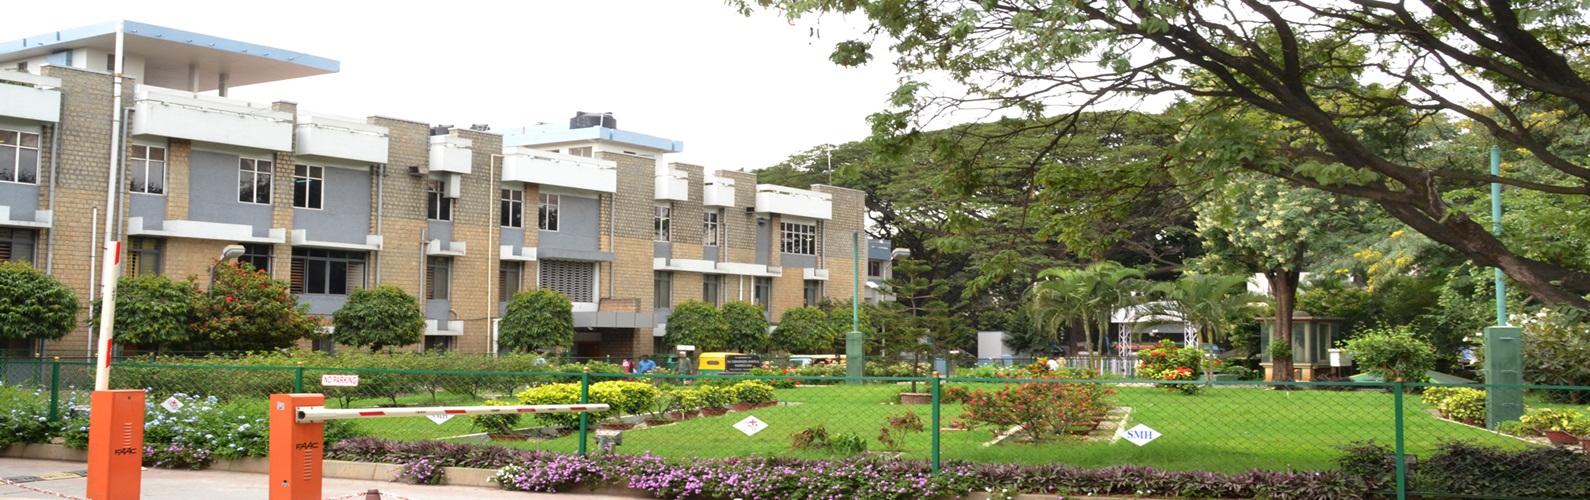 St. Martha'S Hospital Image